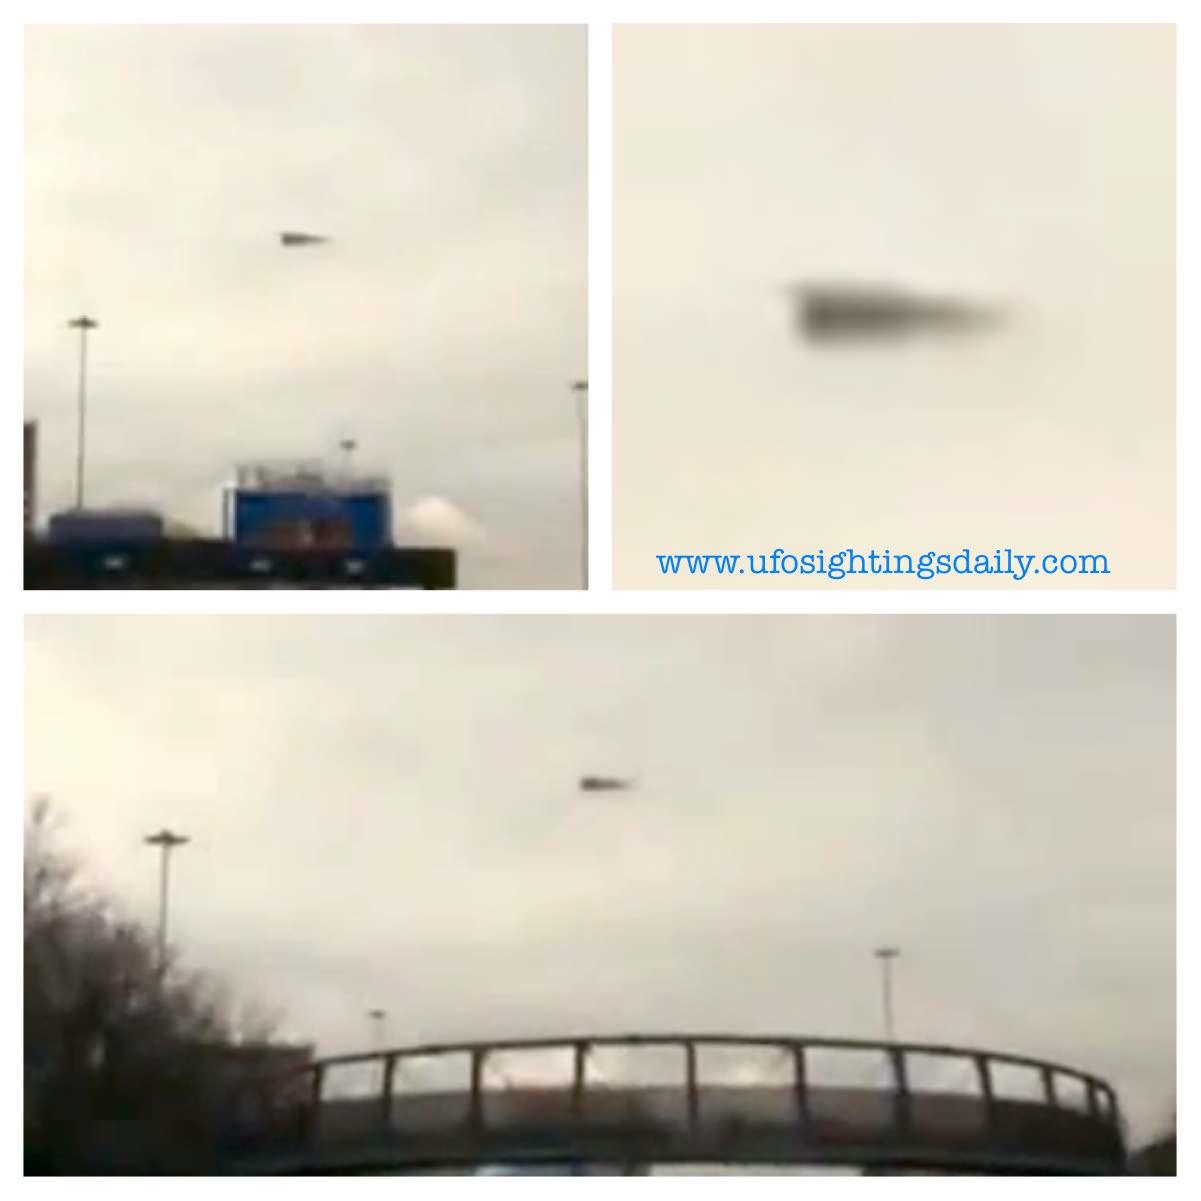 UFO April 2013